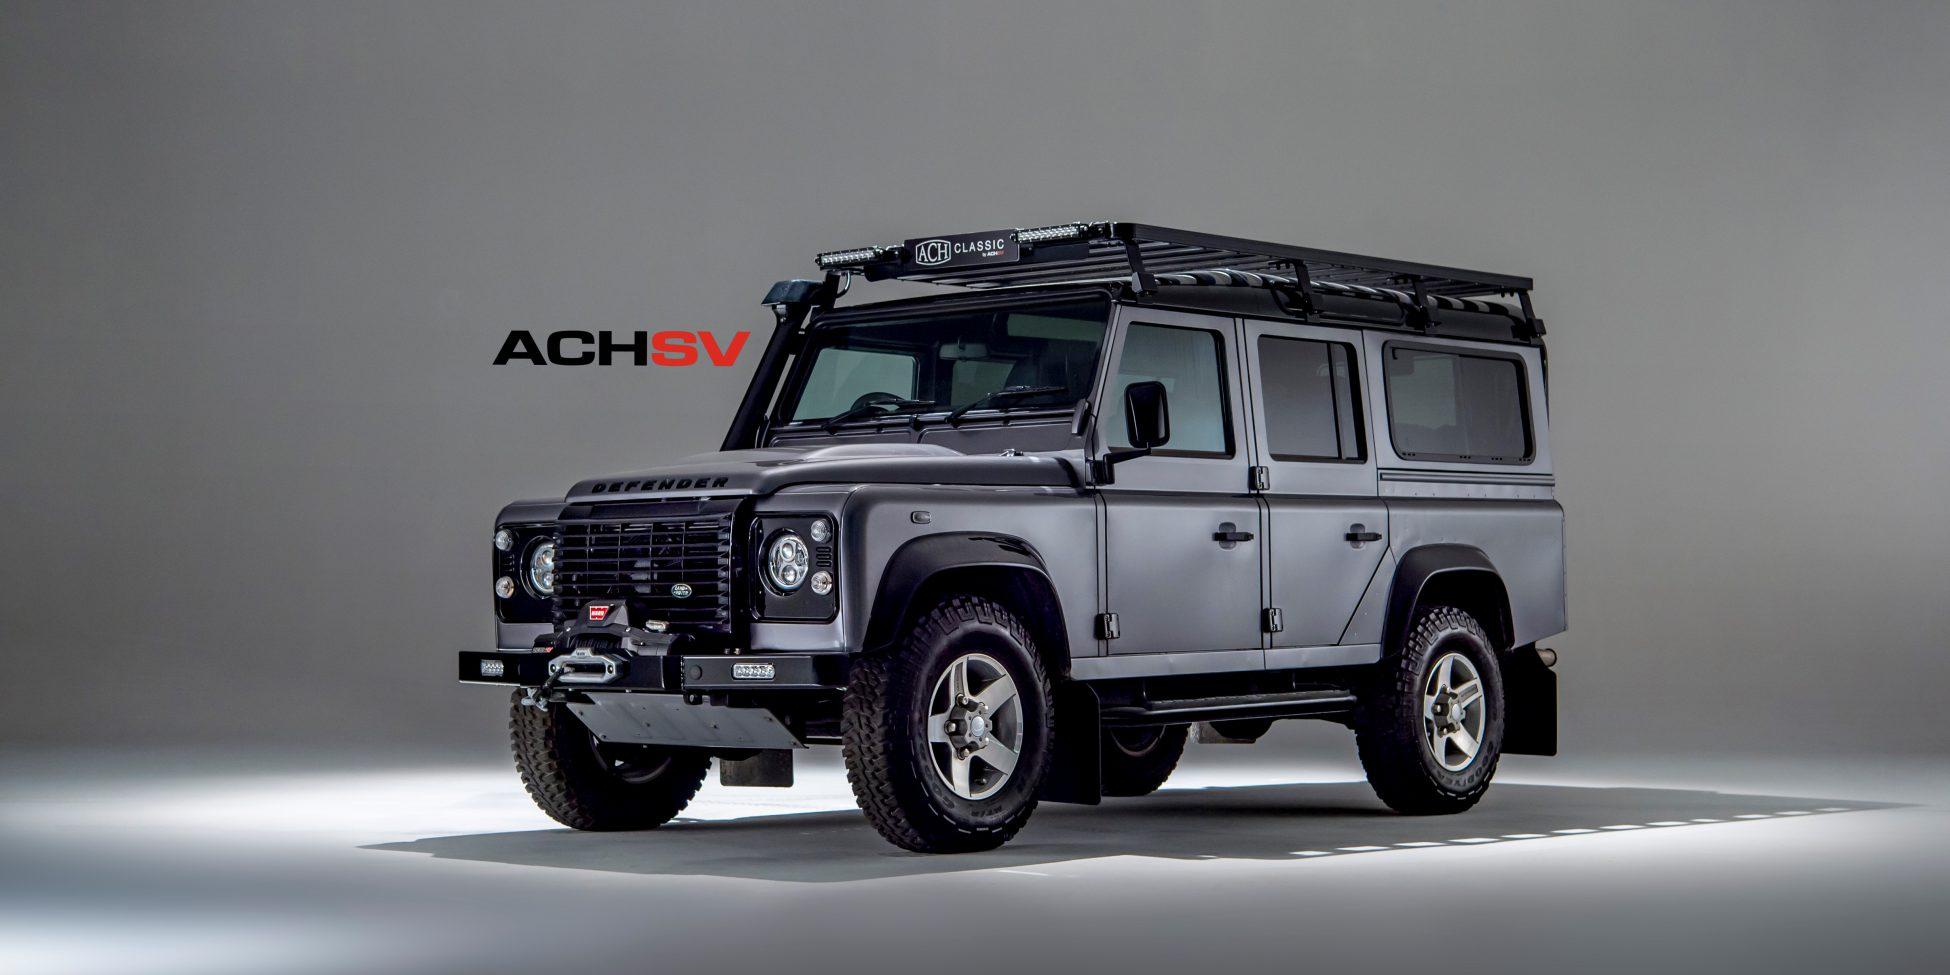 ACHSV Land Rover Defender 110